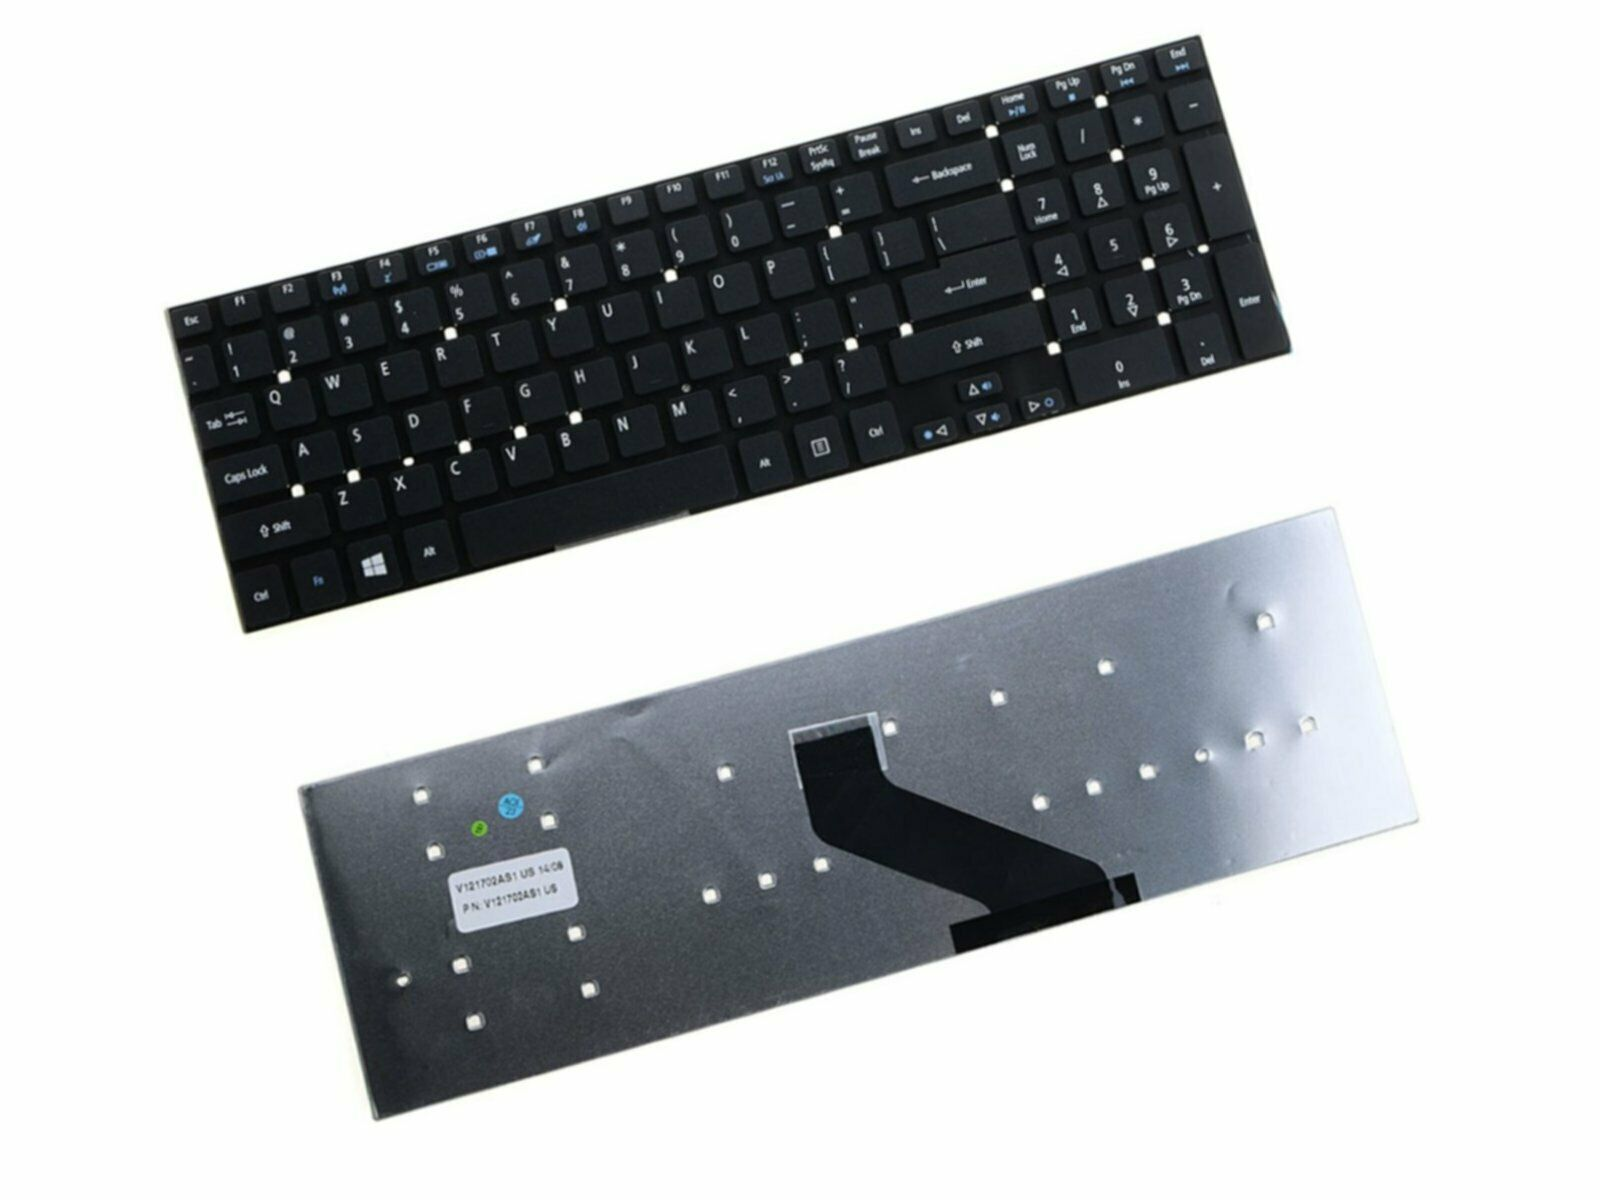 RU//Russian Keyboard for ACER Aspire E5-572G E5-721 E5-731 E5-731G  Series Laptop